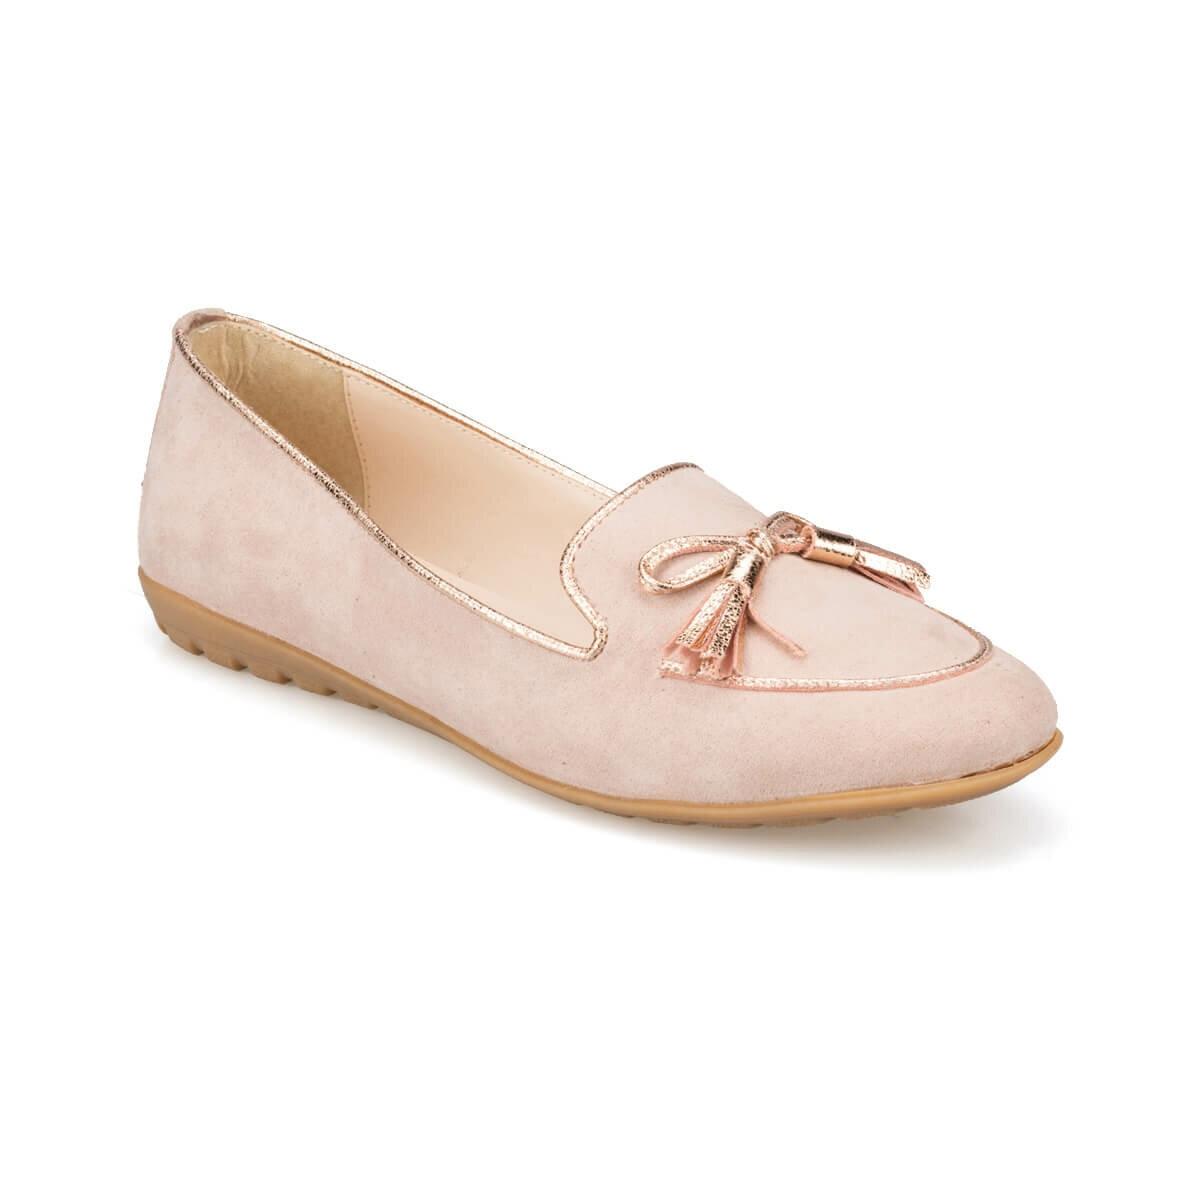 FLO 91.313056.Z Powder Women 'S Loafer Shoes Polaris